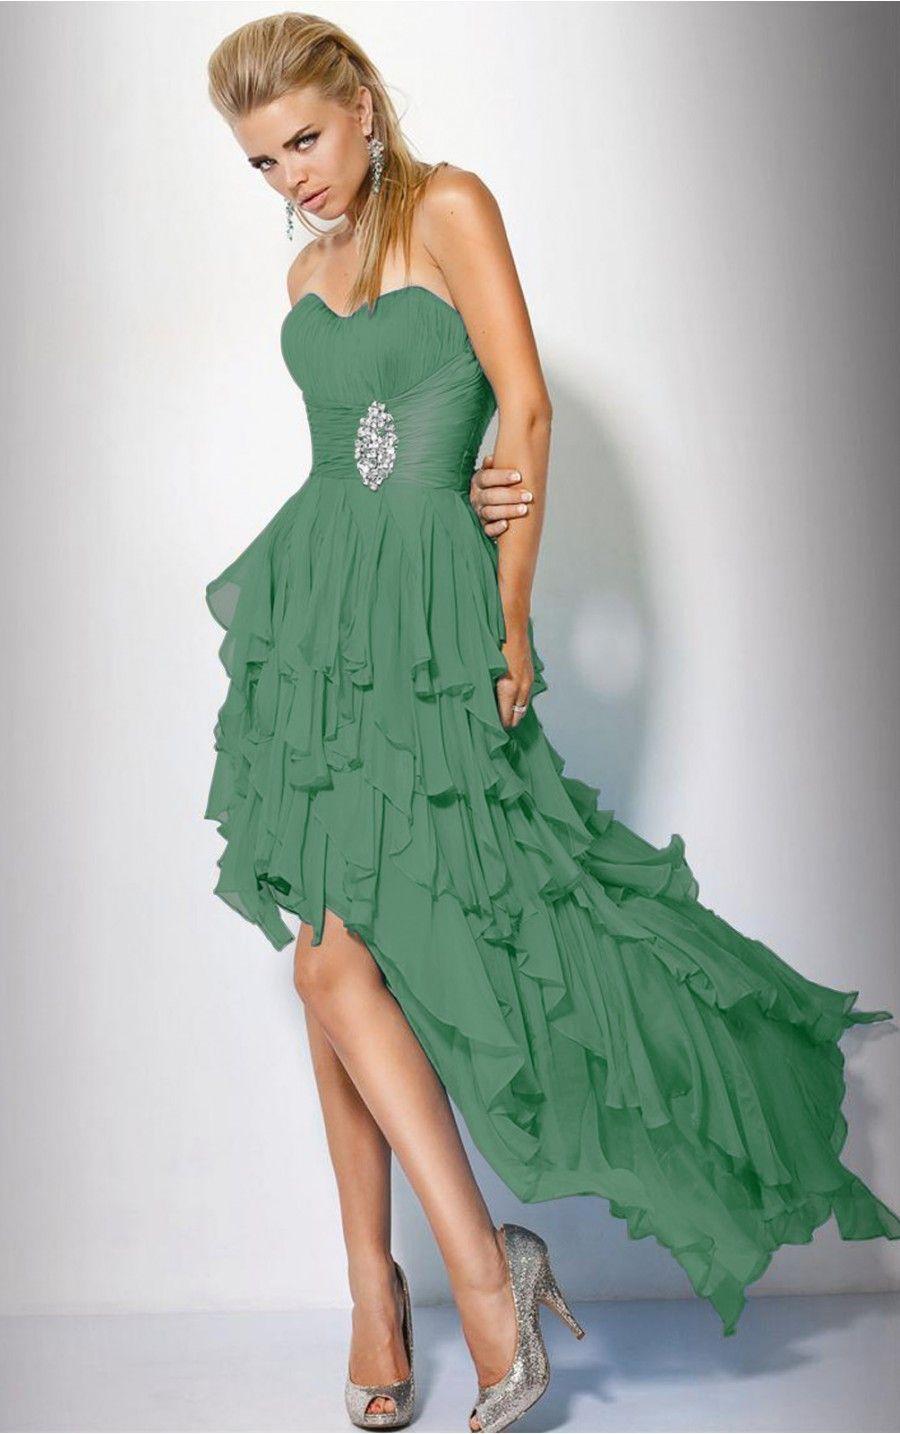 Pin by tina gao on wedding dress pinterest wedding dress and